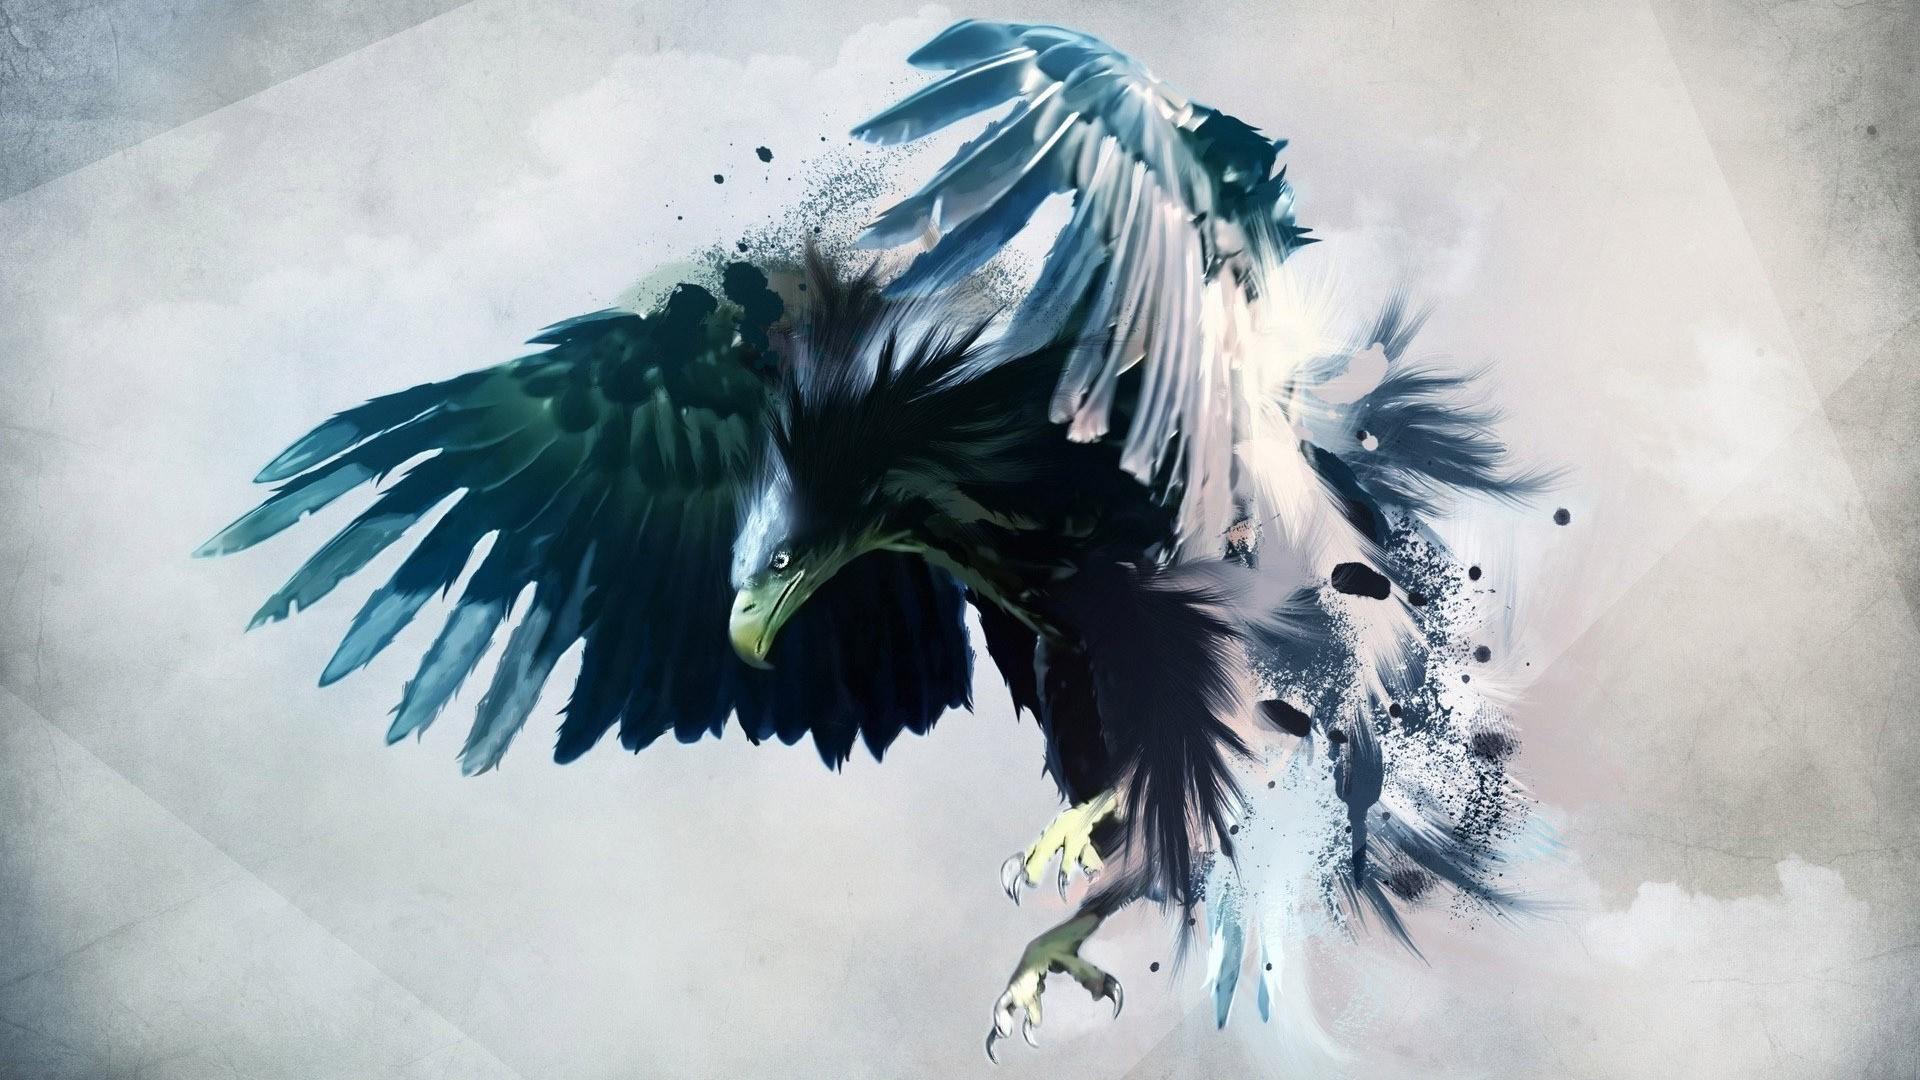 philadelphia eagles wallpaper download free amazing hd